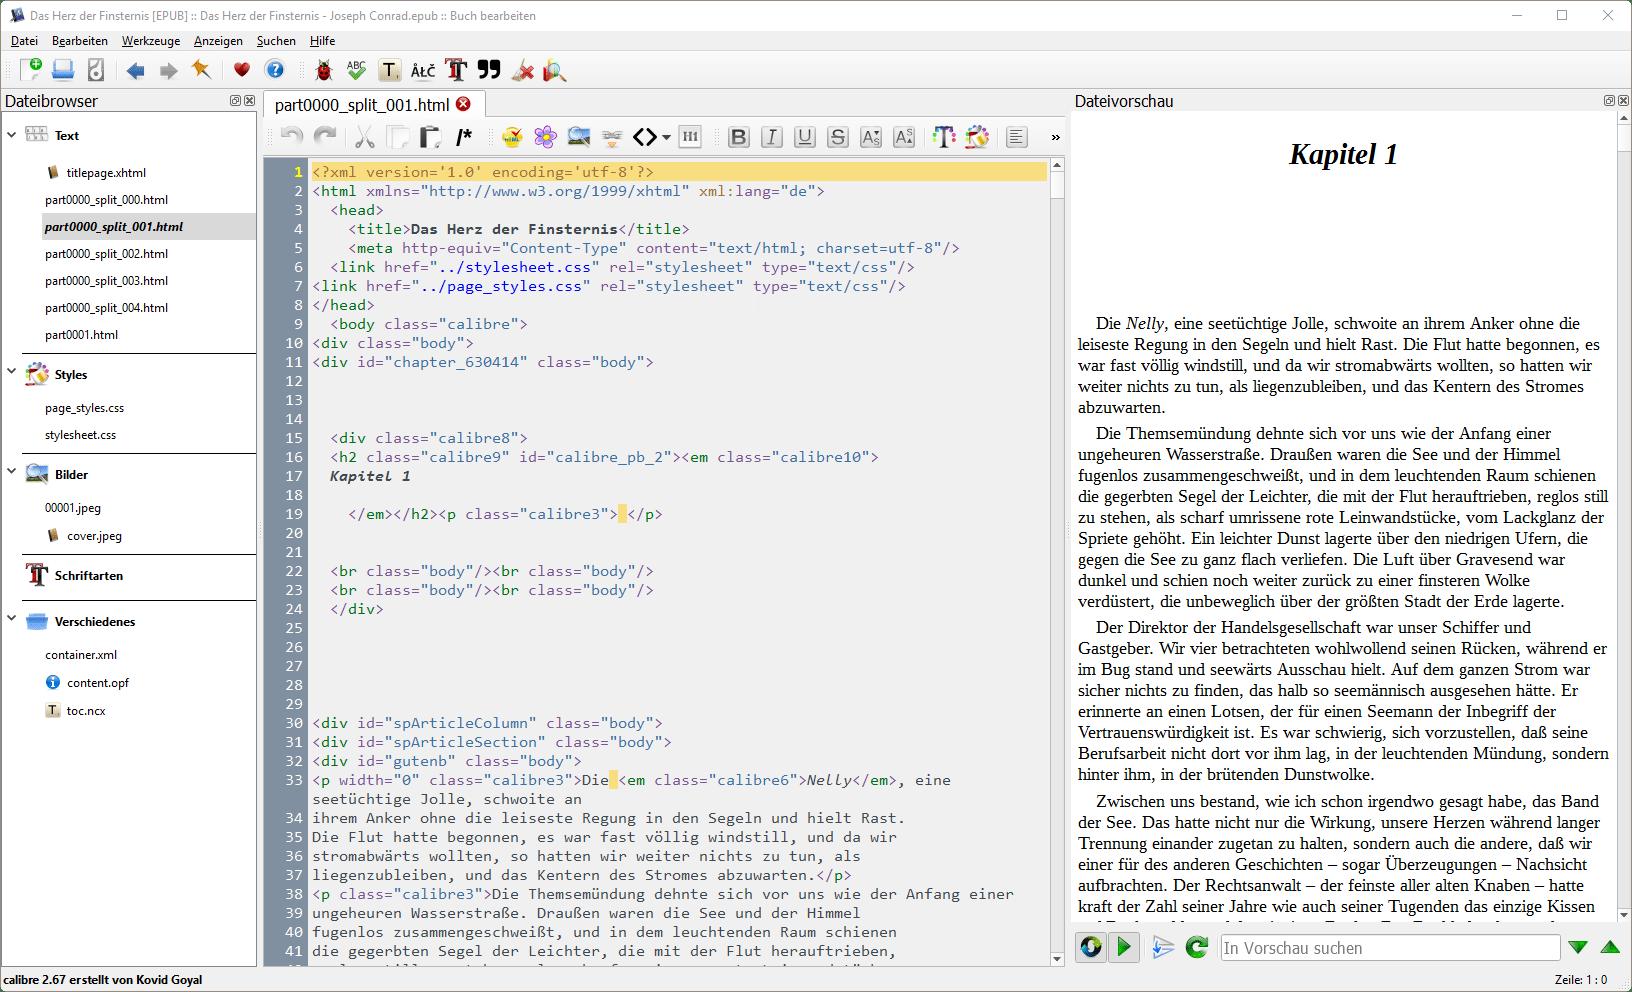 In Calibre kann man E-Books sogar mit einem WYSIWYG-Editor bearbeiten.